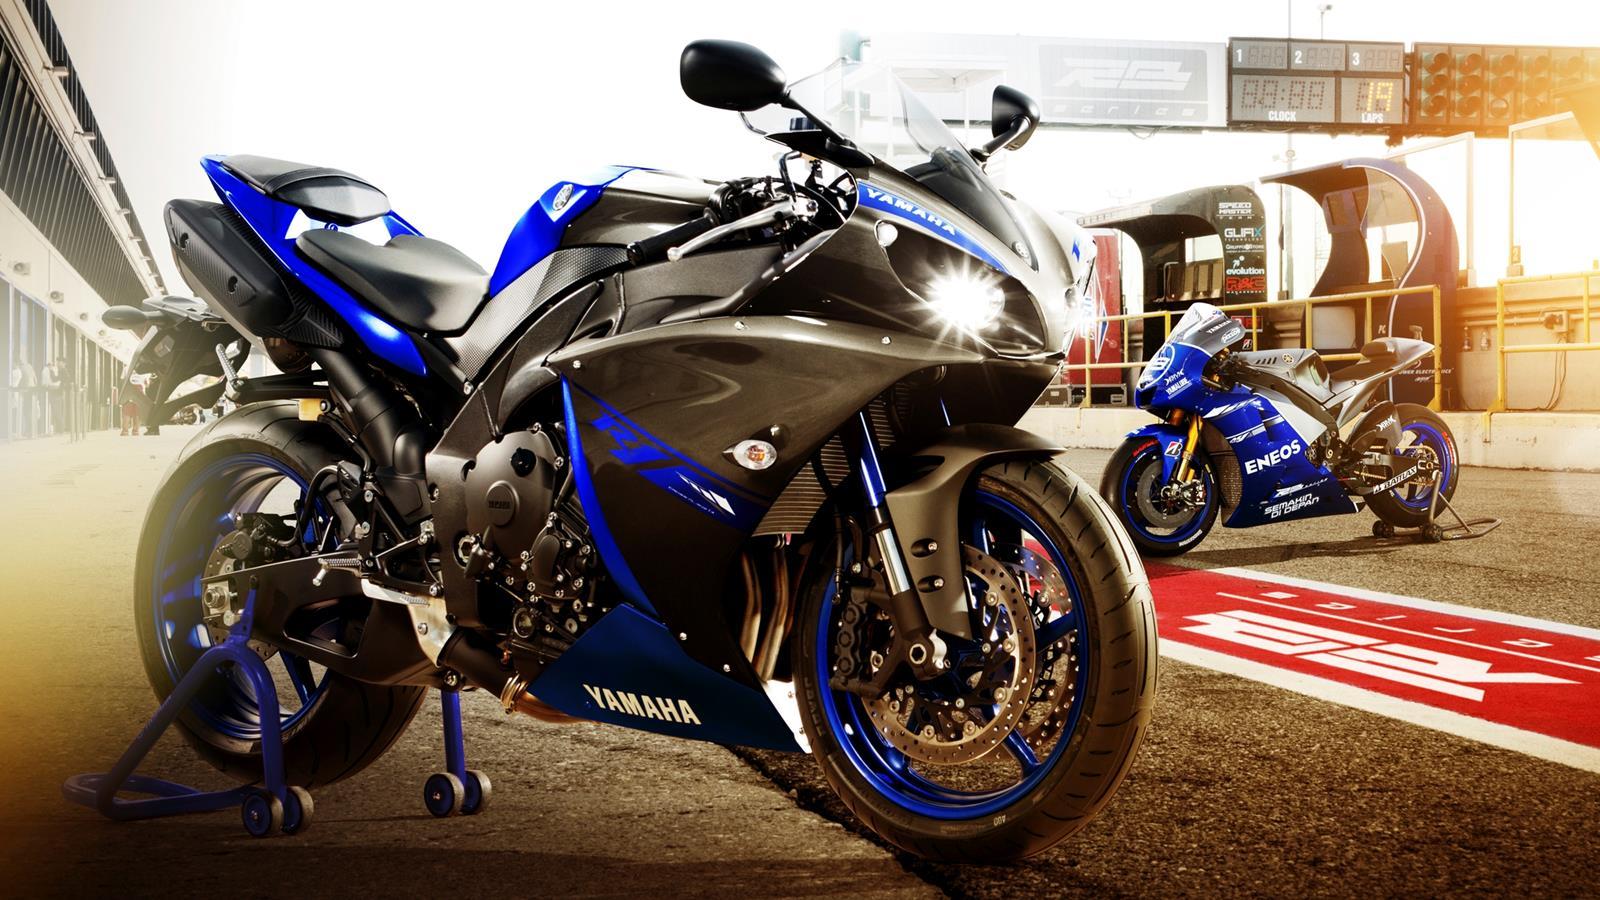 Yamaha R1 Image download best HD   digitalimagemakerworldcom 1600x900